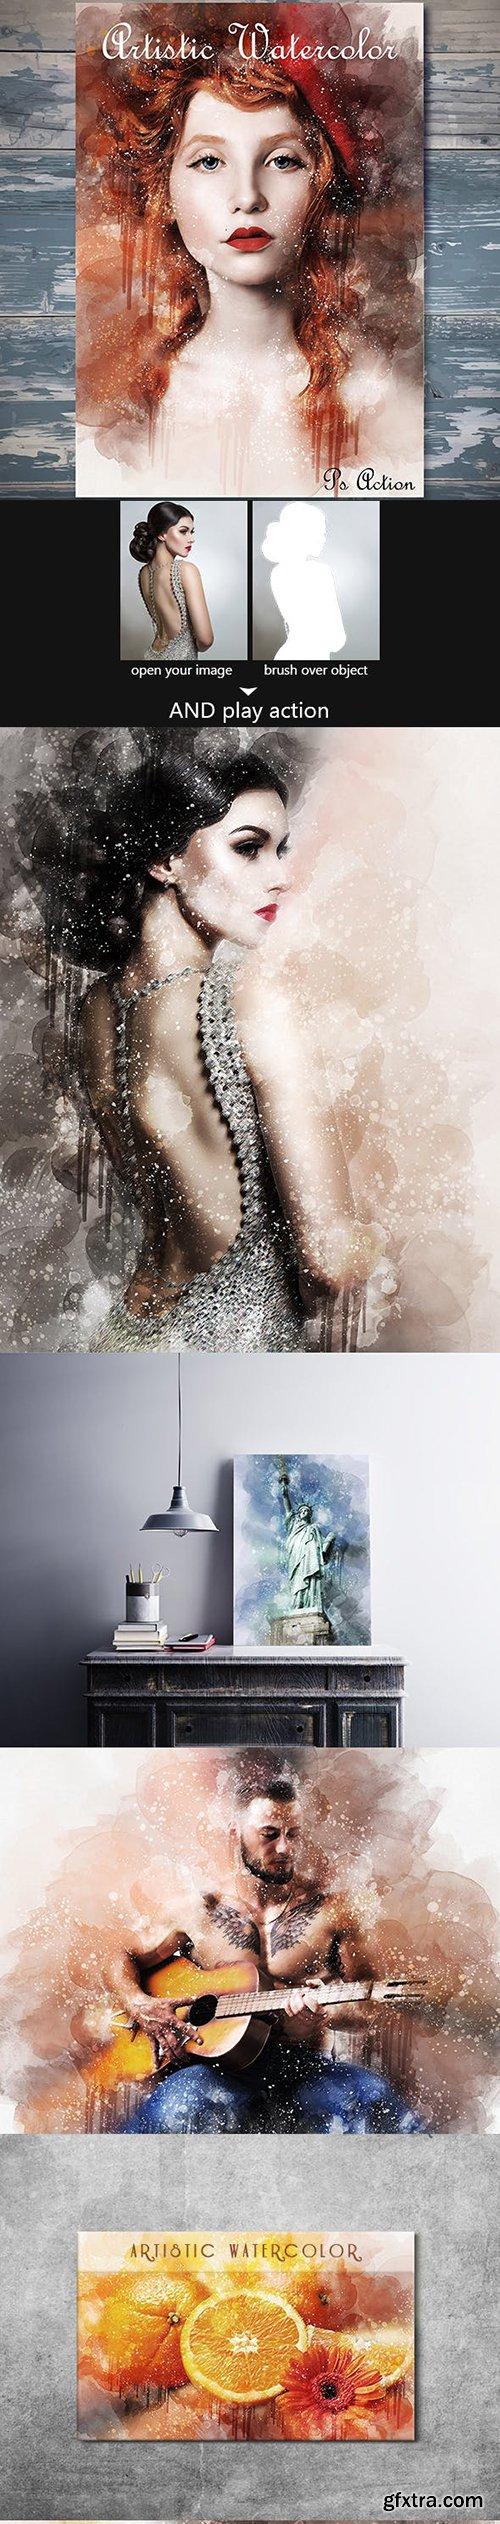 Graphicriver - Artistic Watercolor Photoshop Action 21411826